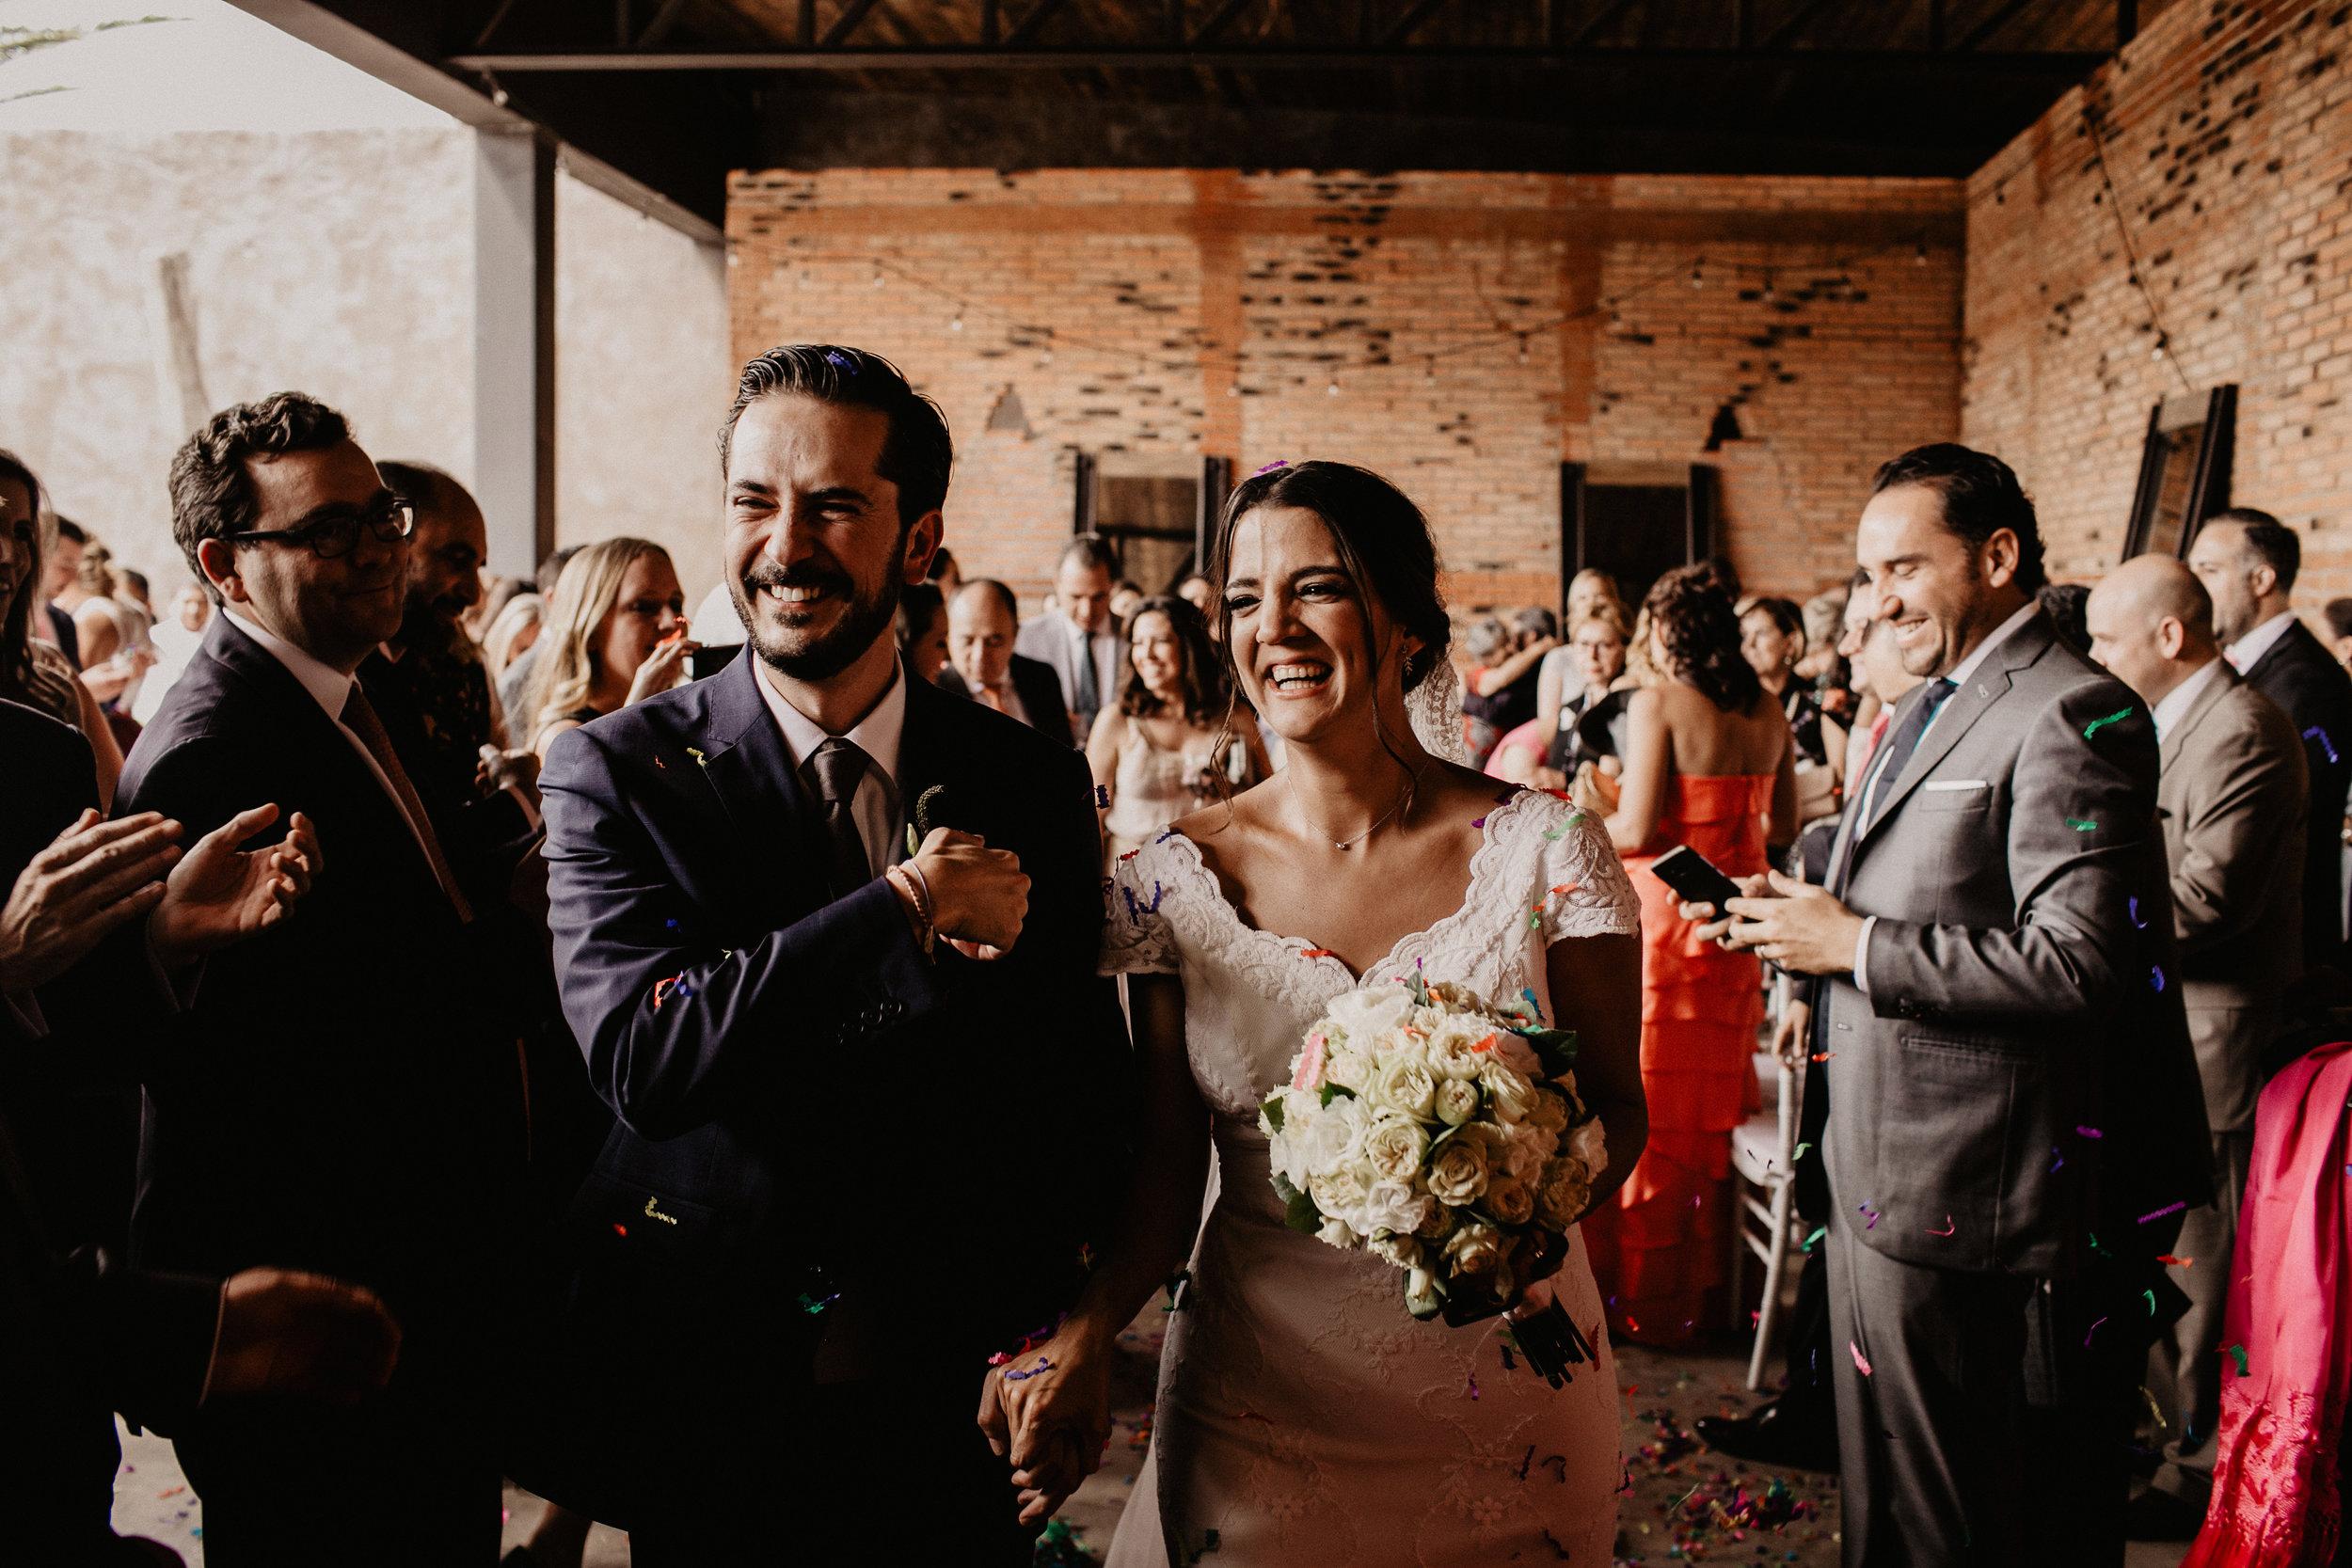 alfonso_flores_destination_wedding_photographer_pau_alonso_672.JPG